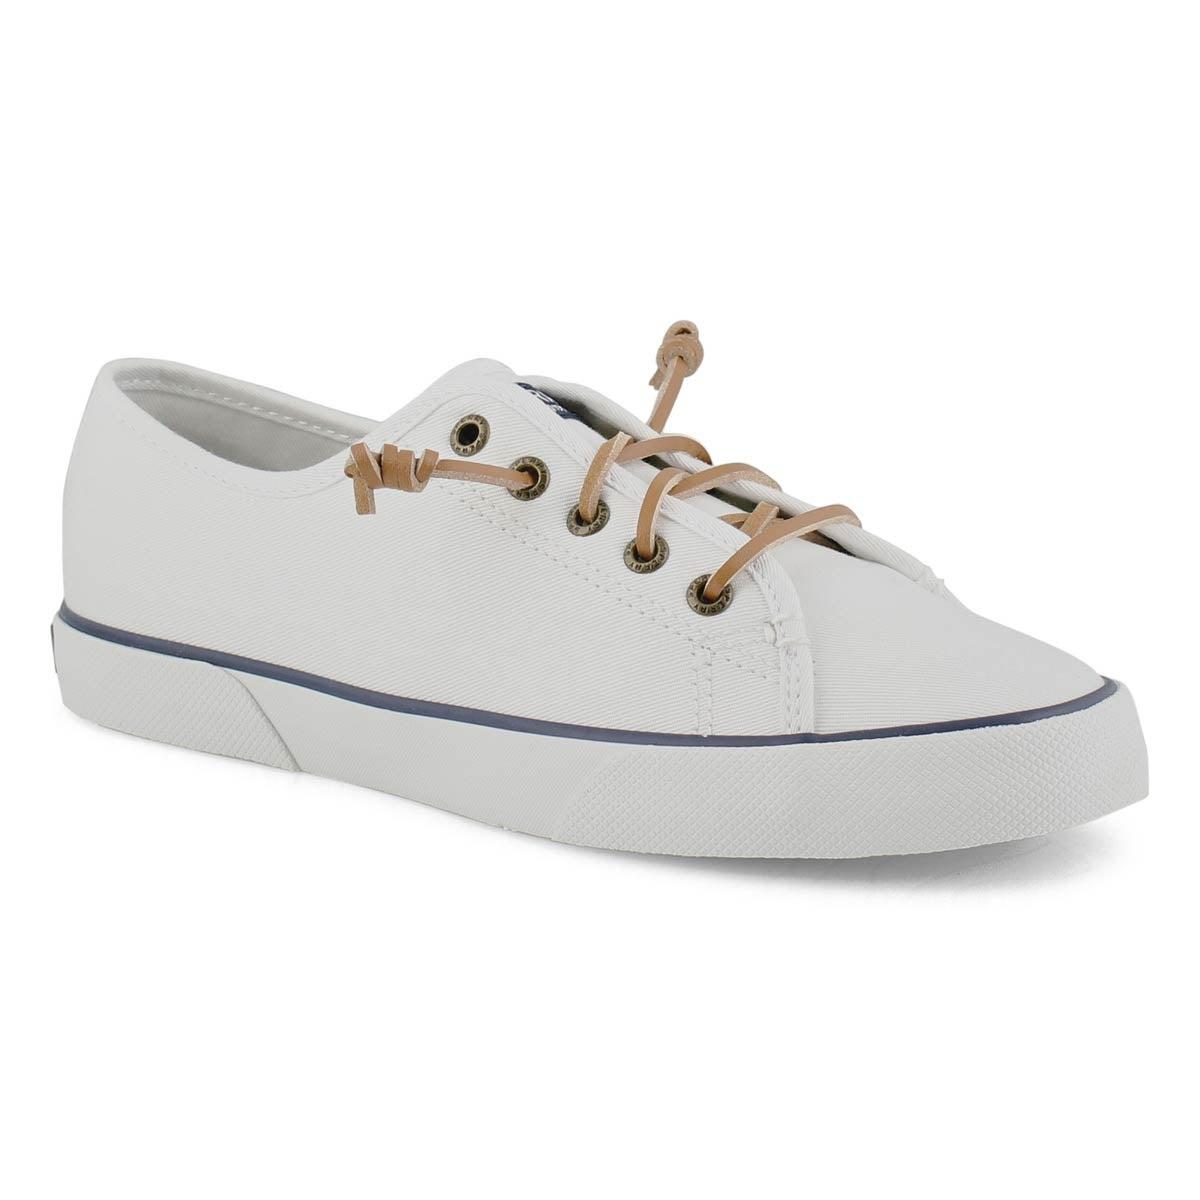 Women's PIER VIEW white sneakers